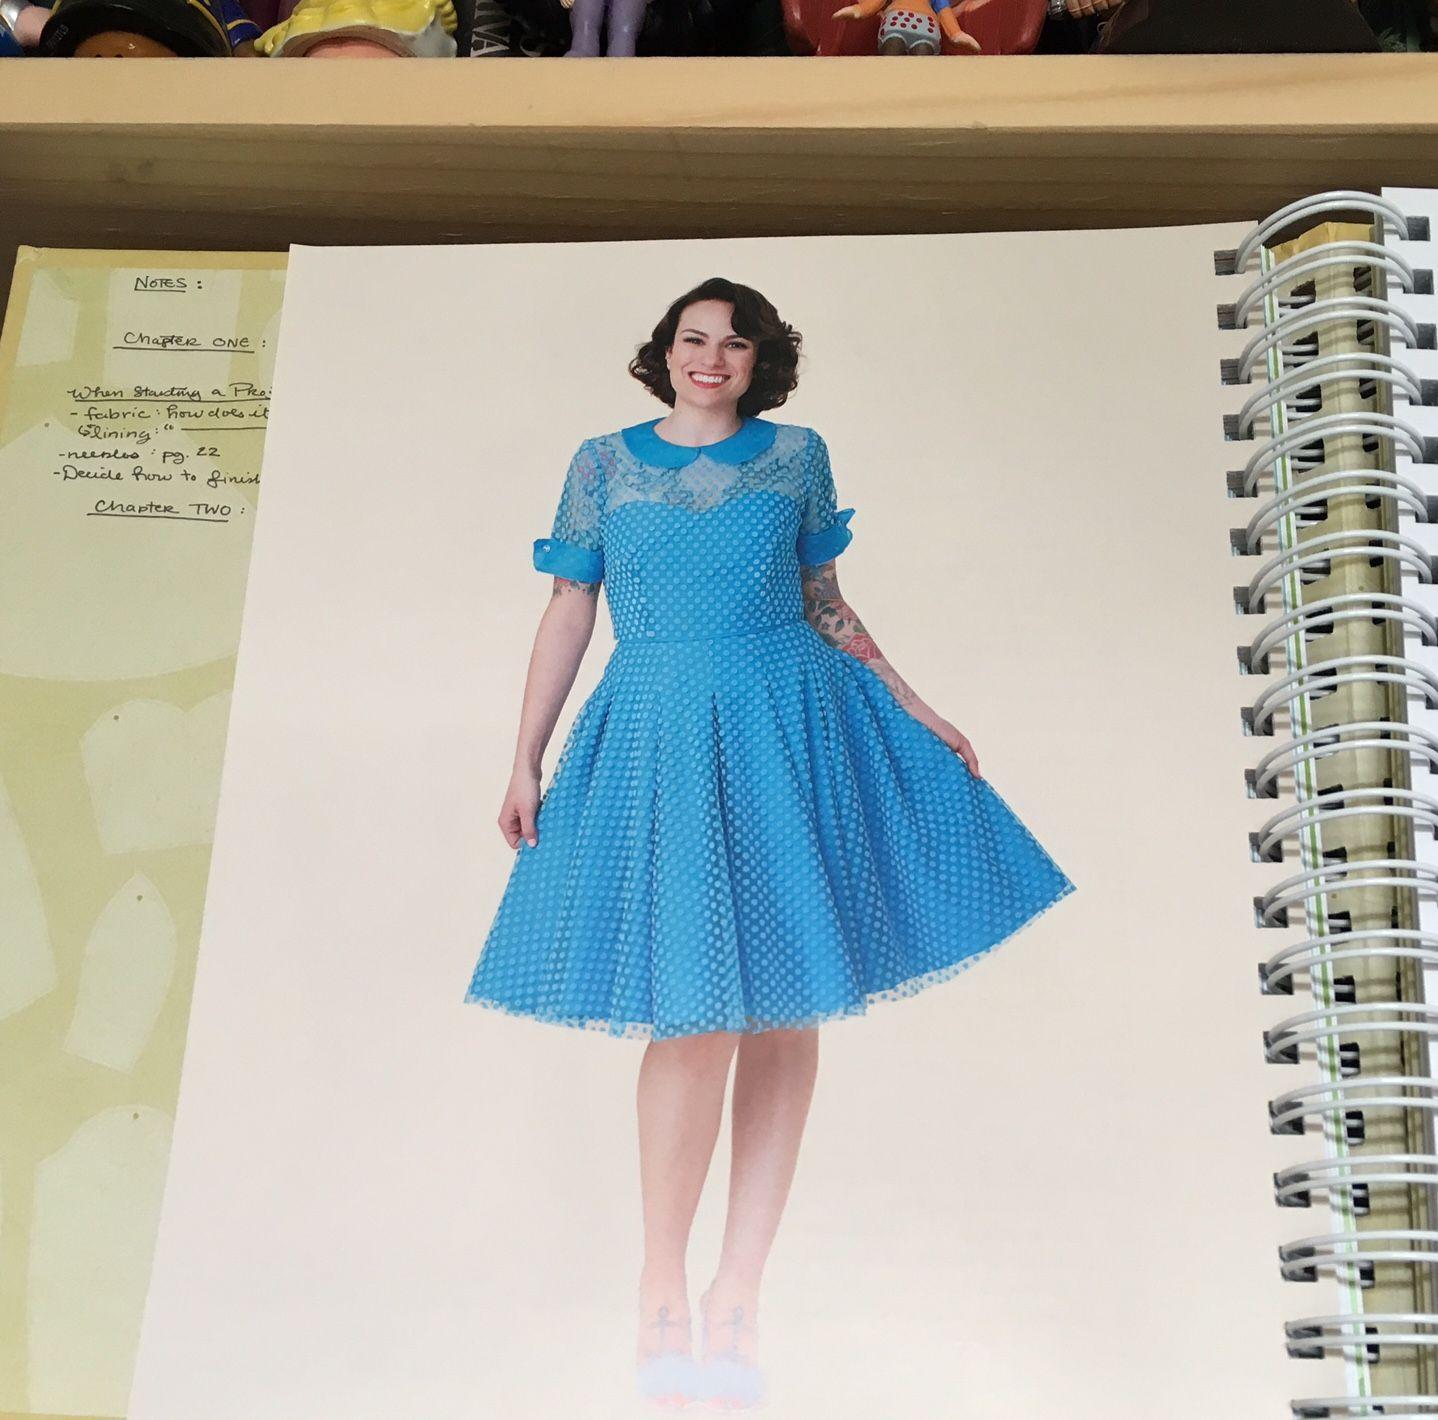 Cherry Corduroy Dress - Gertie\'s Ultimate Dress Book   Pattern ...